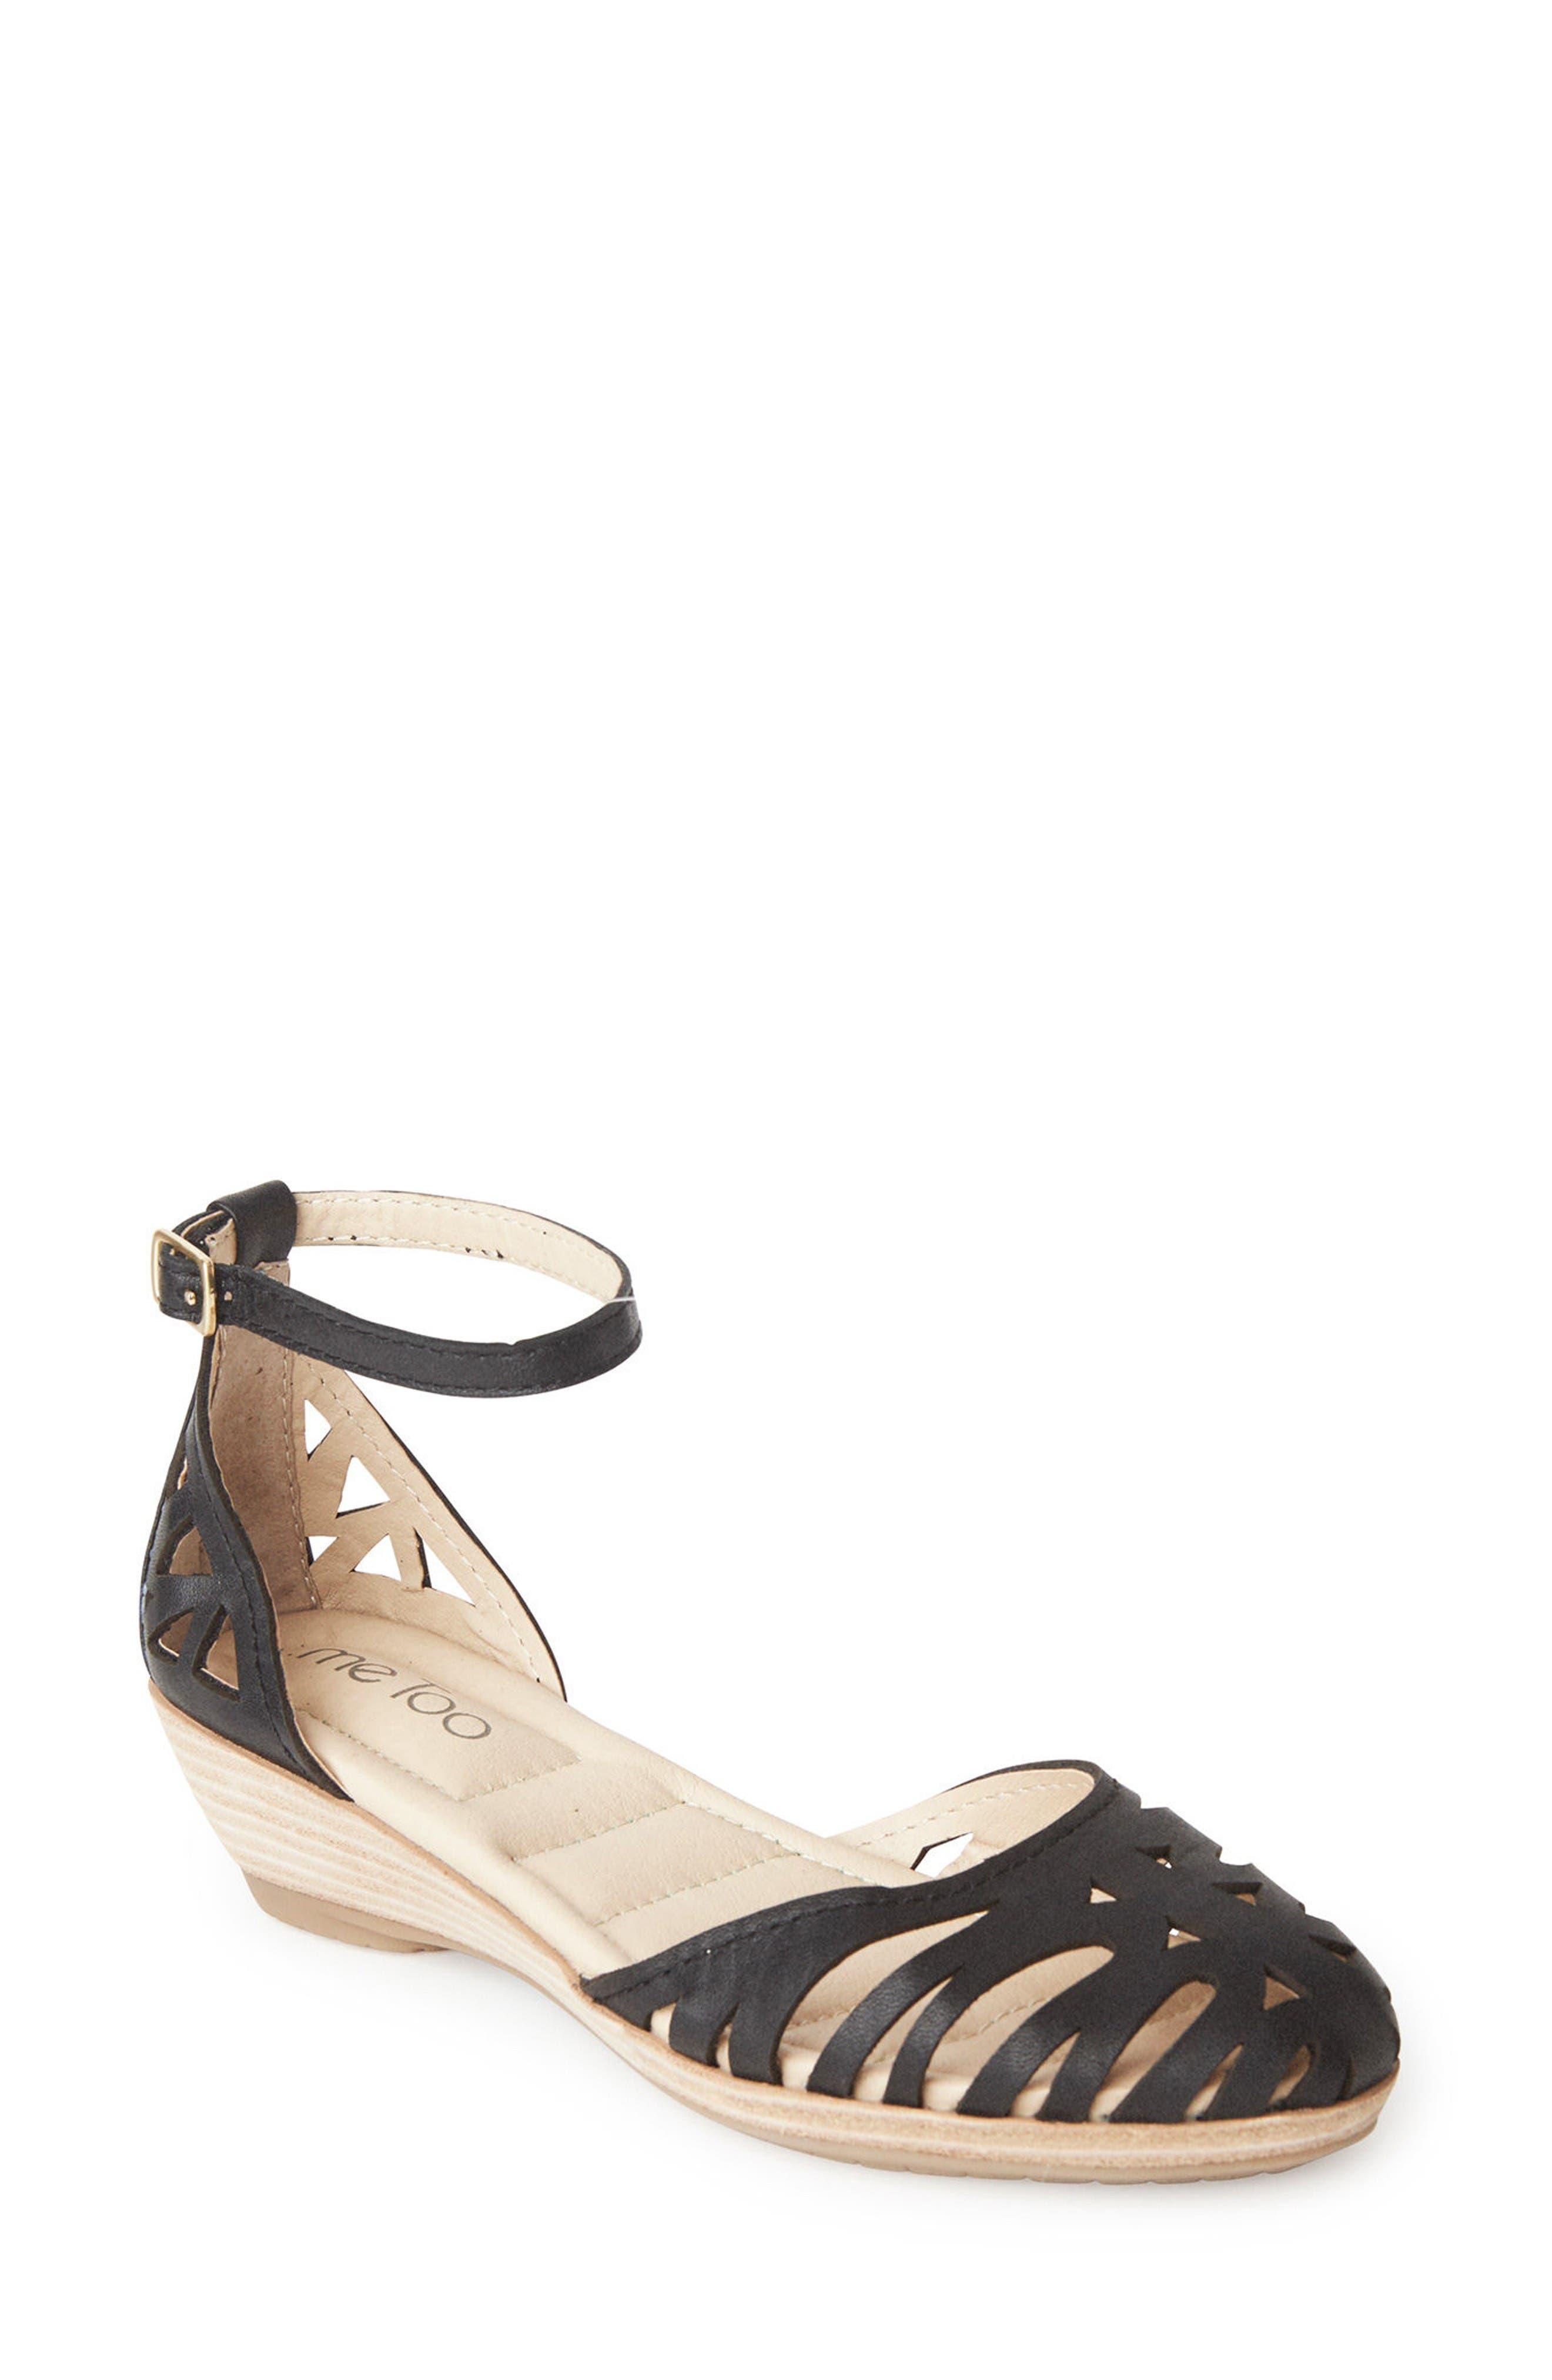 Nalani Ankle Strap Sandal,                         Main,                         color, Black Leather